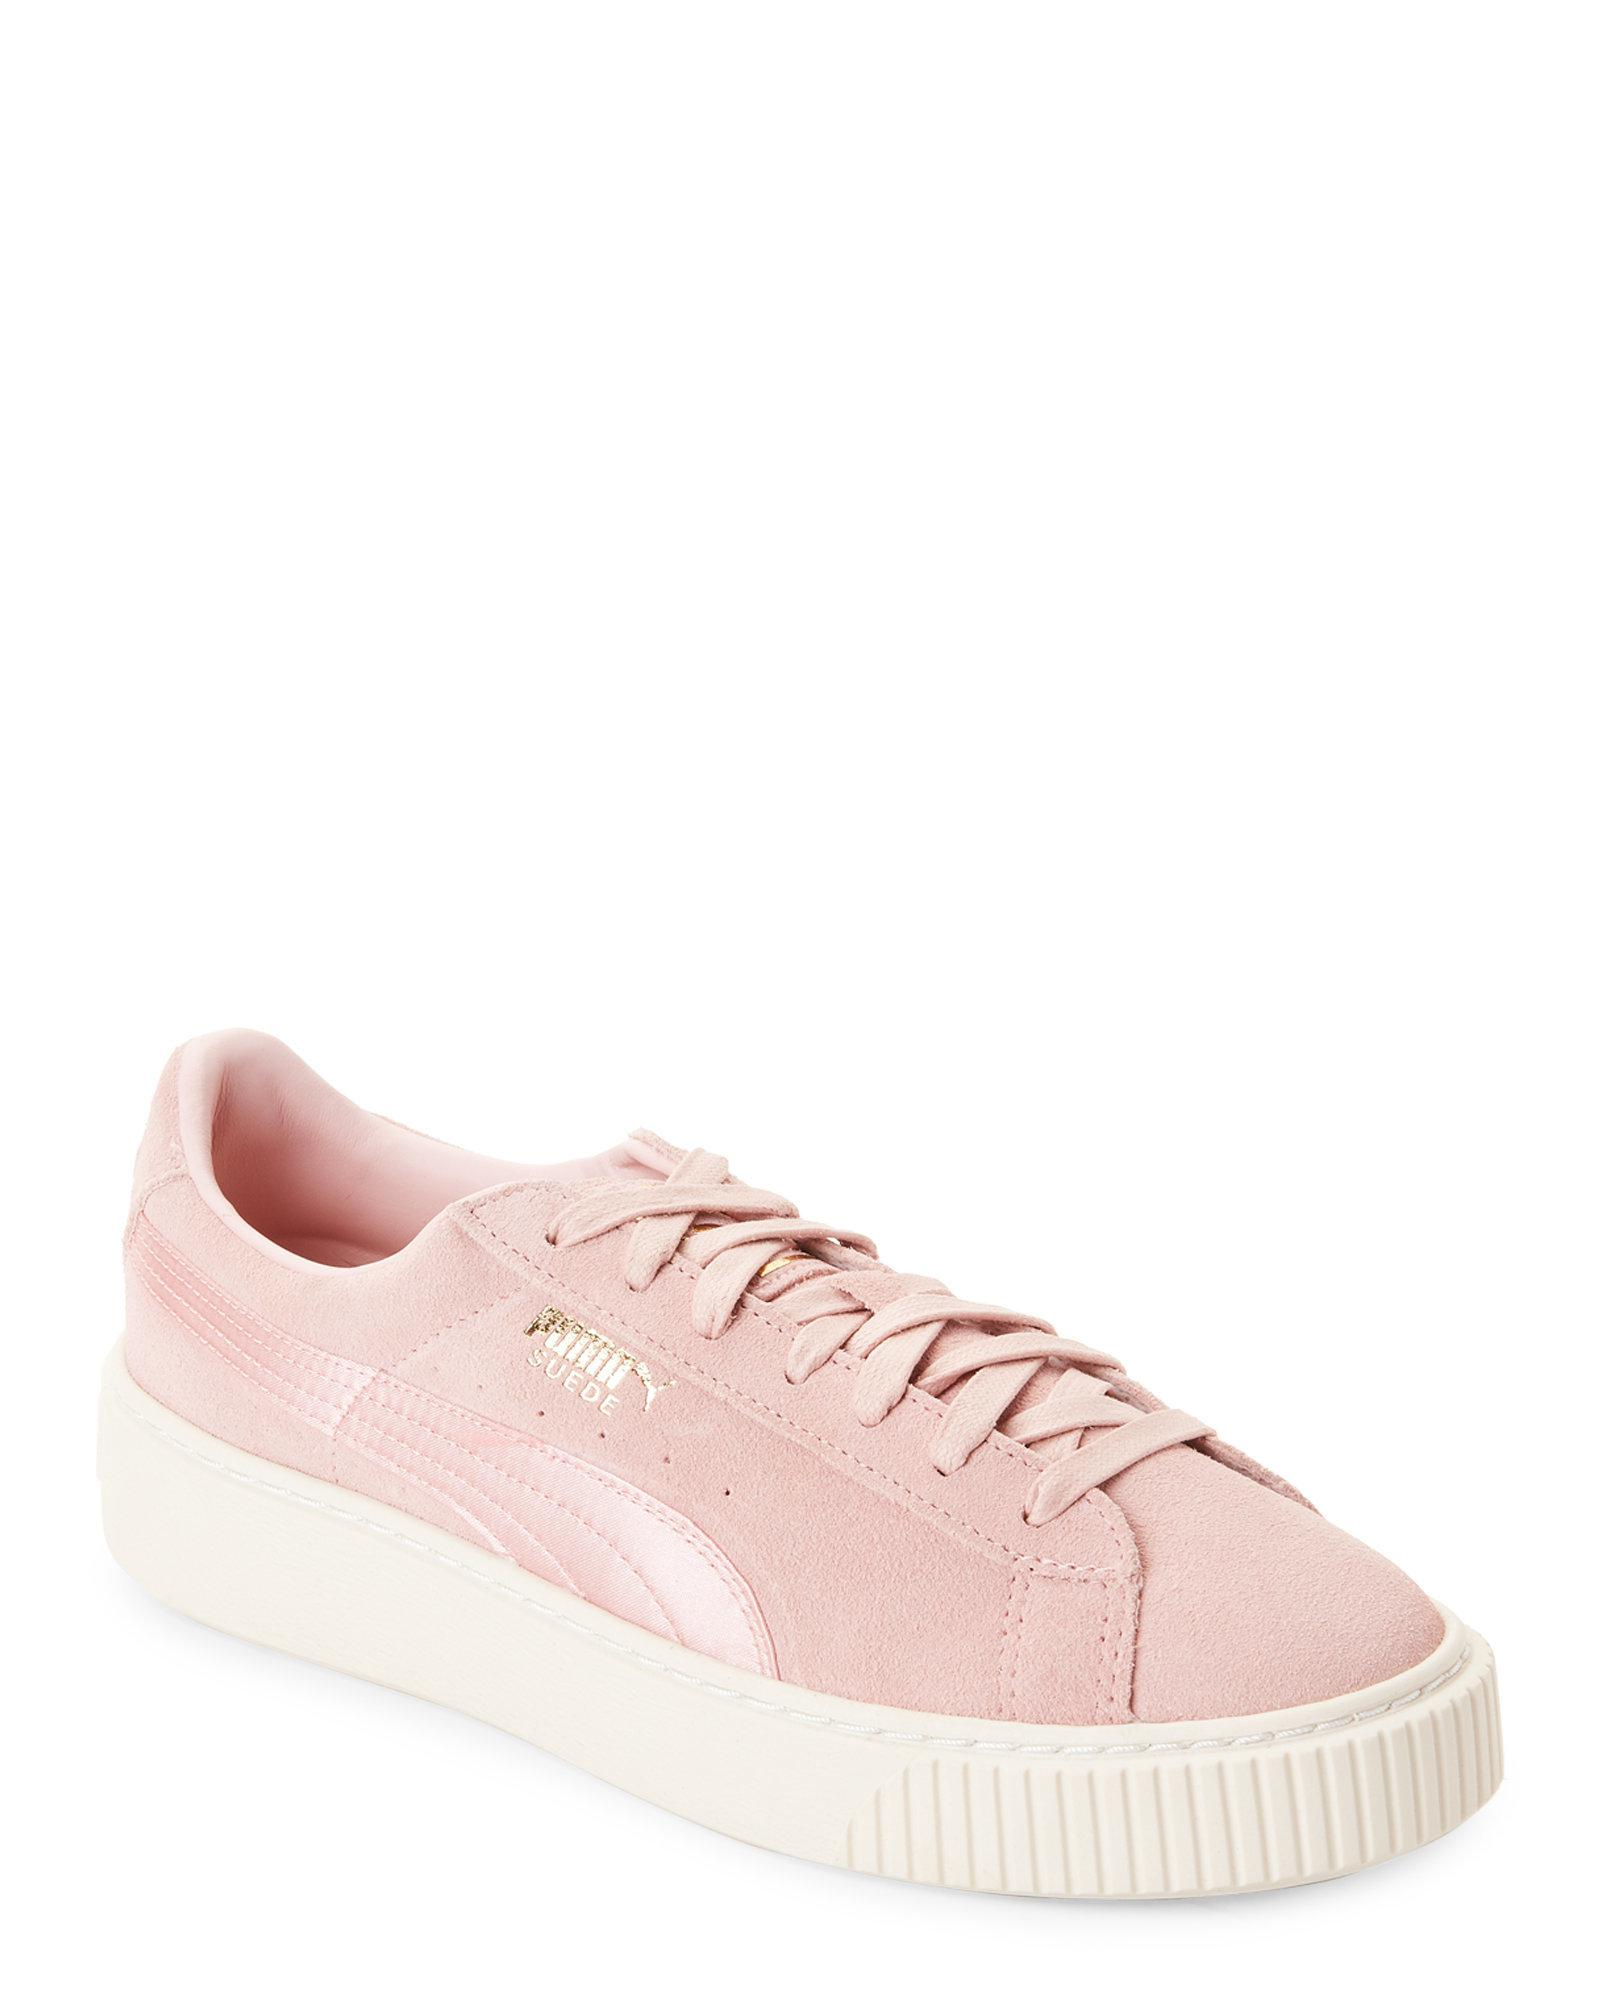 d1ddabac8f86 Lyst - PUMA Light Pink Suede Summer Satin Platform Sneakers in Pink